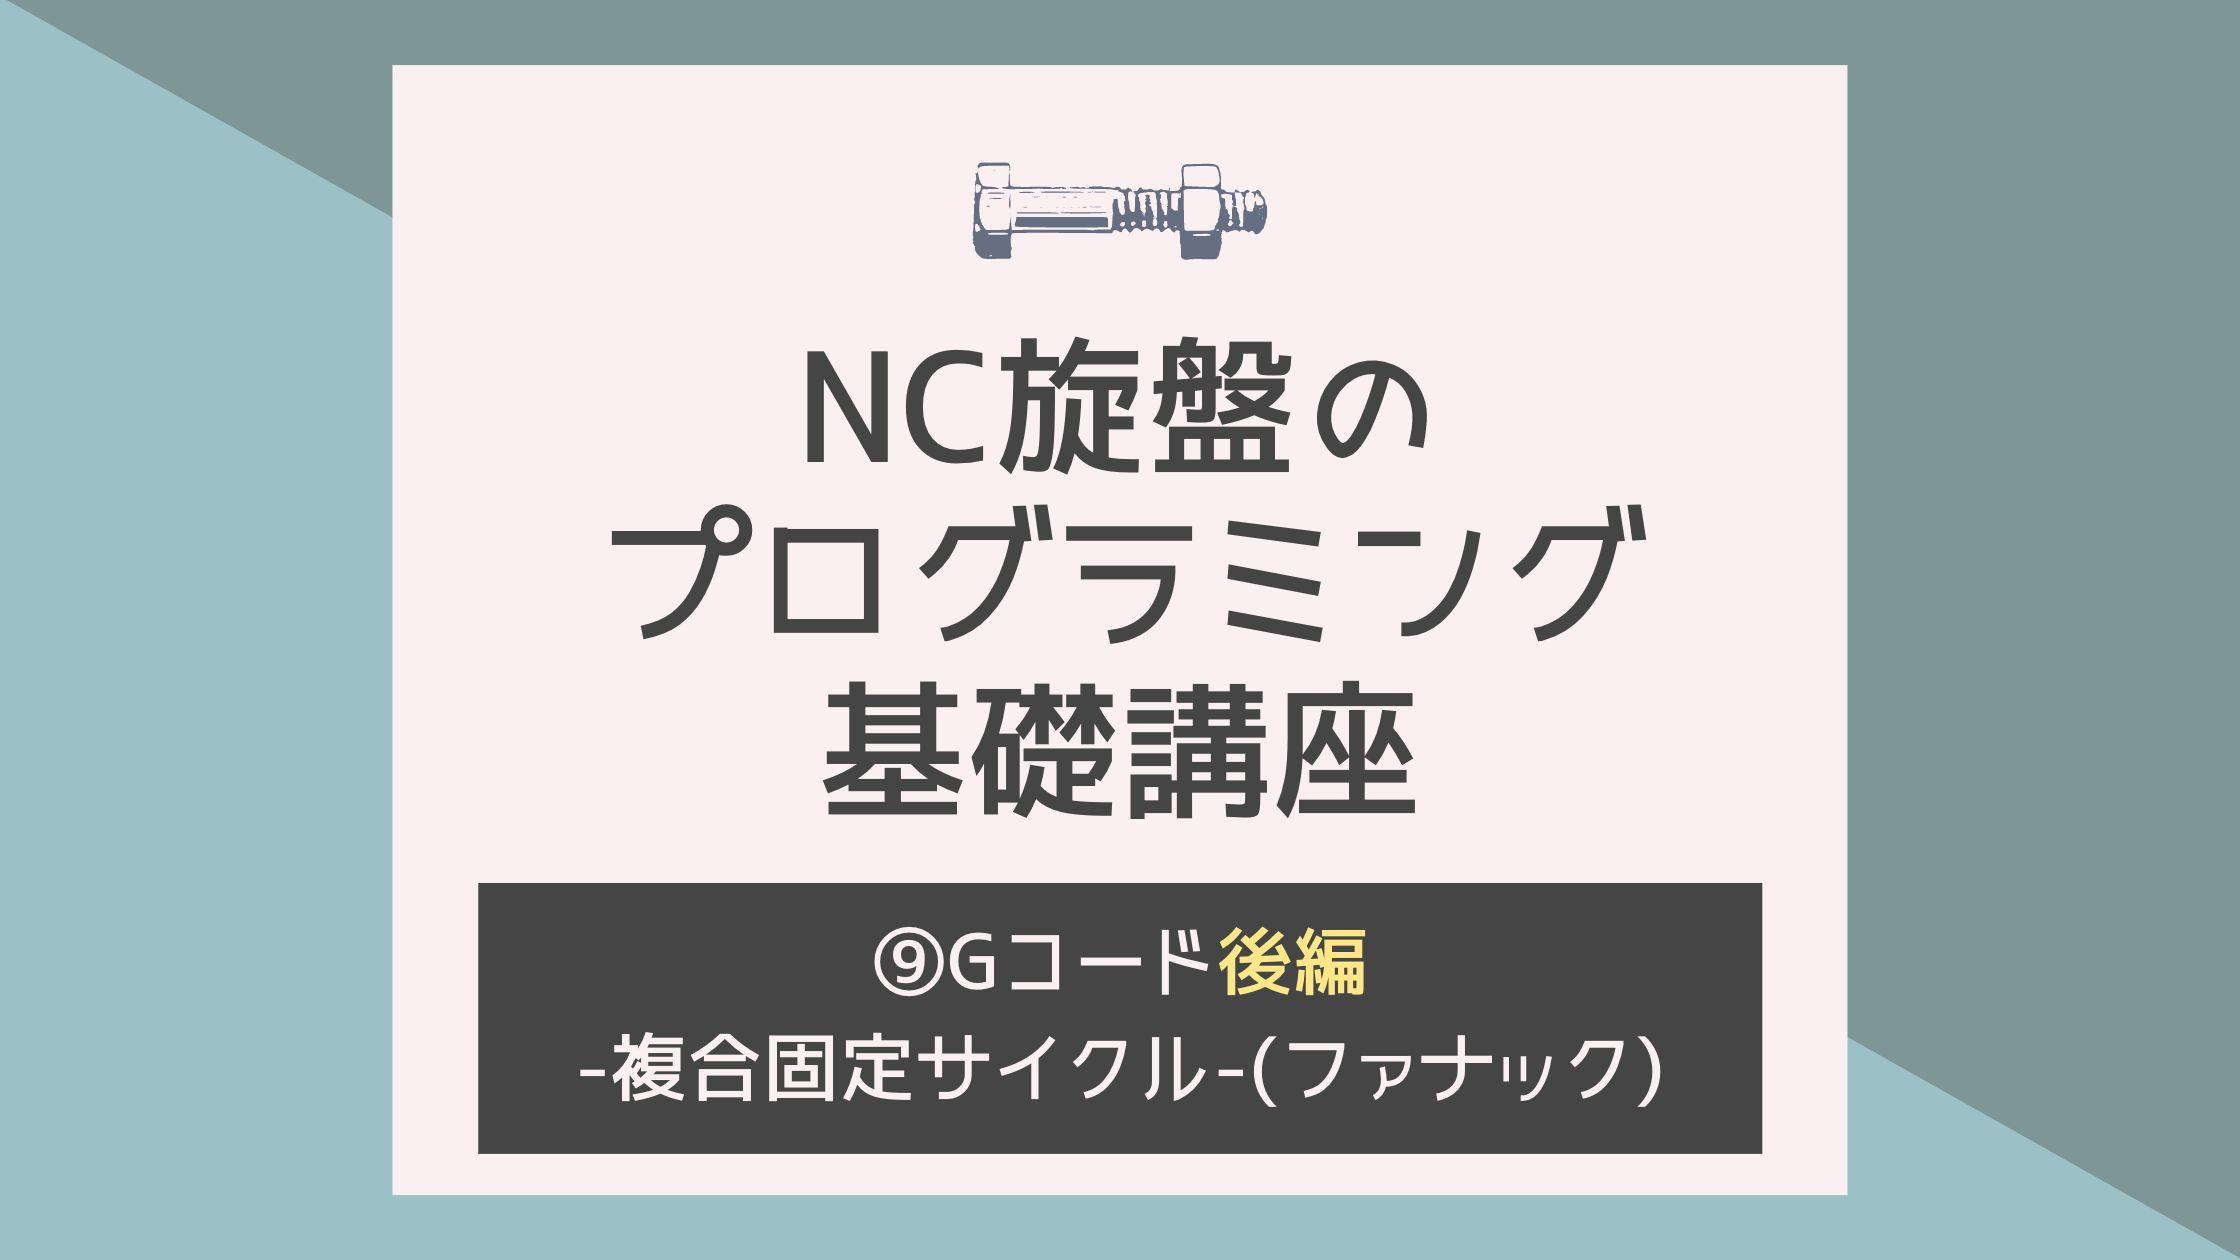 NC旋盤 Gコード 複合固定サイクル